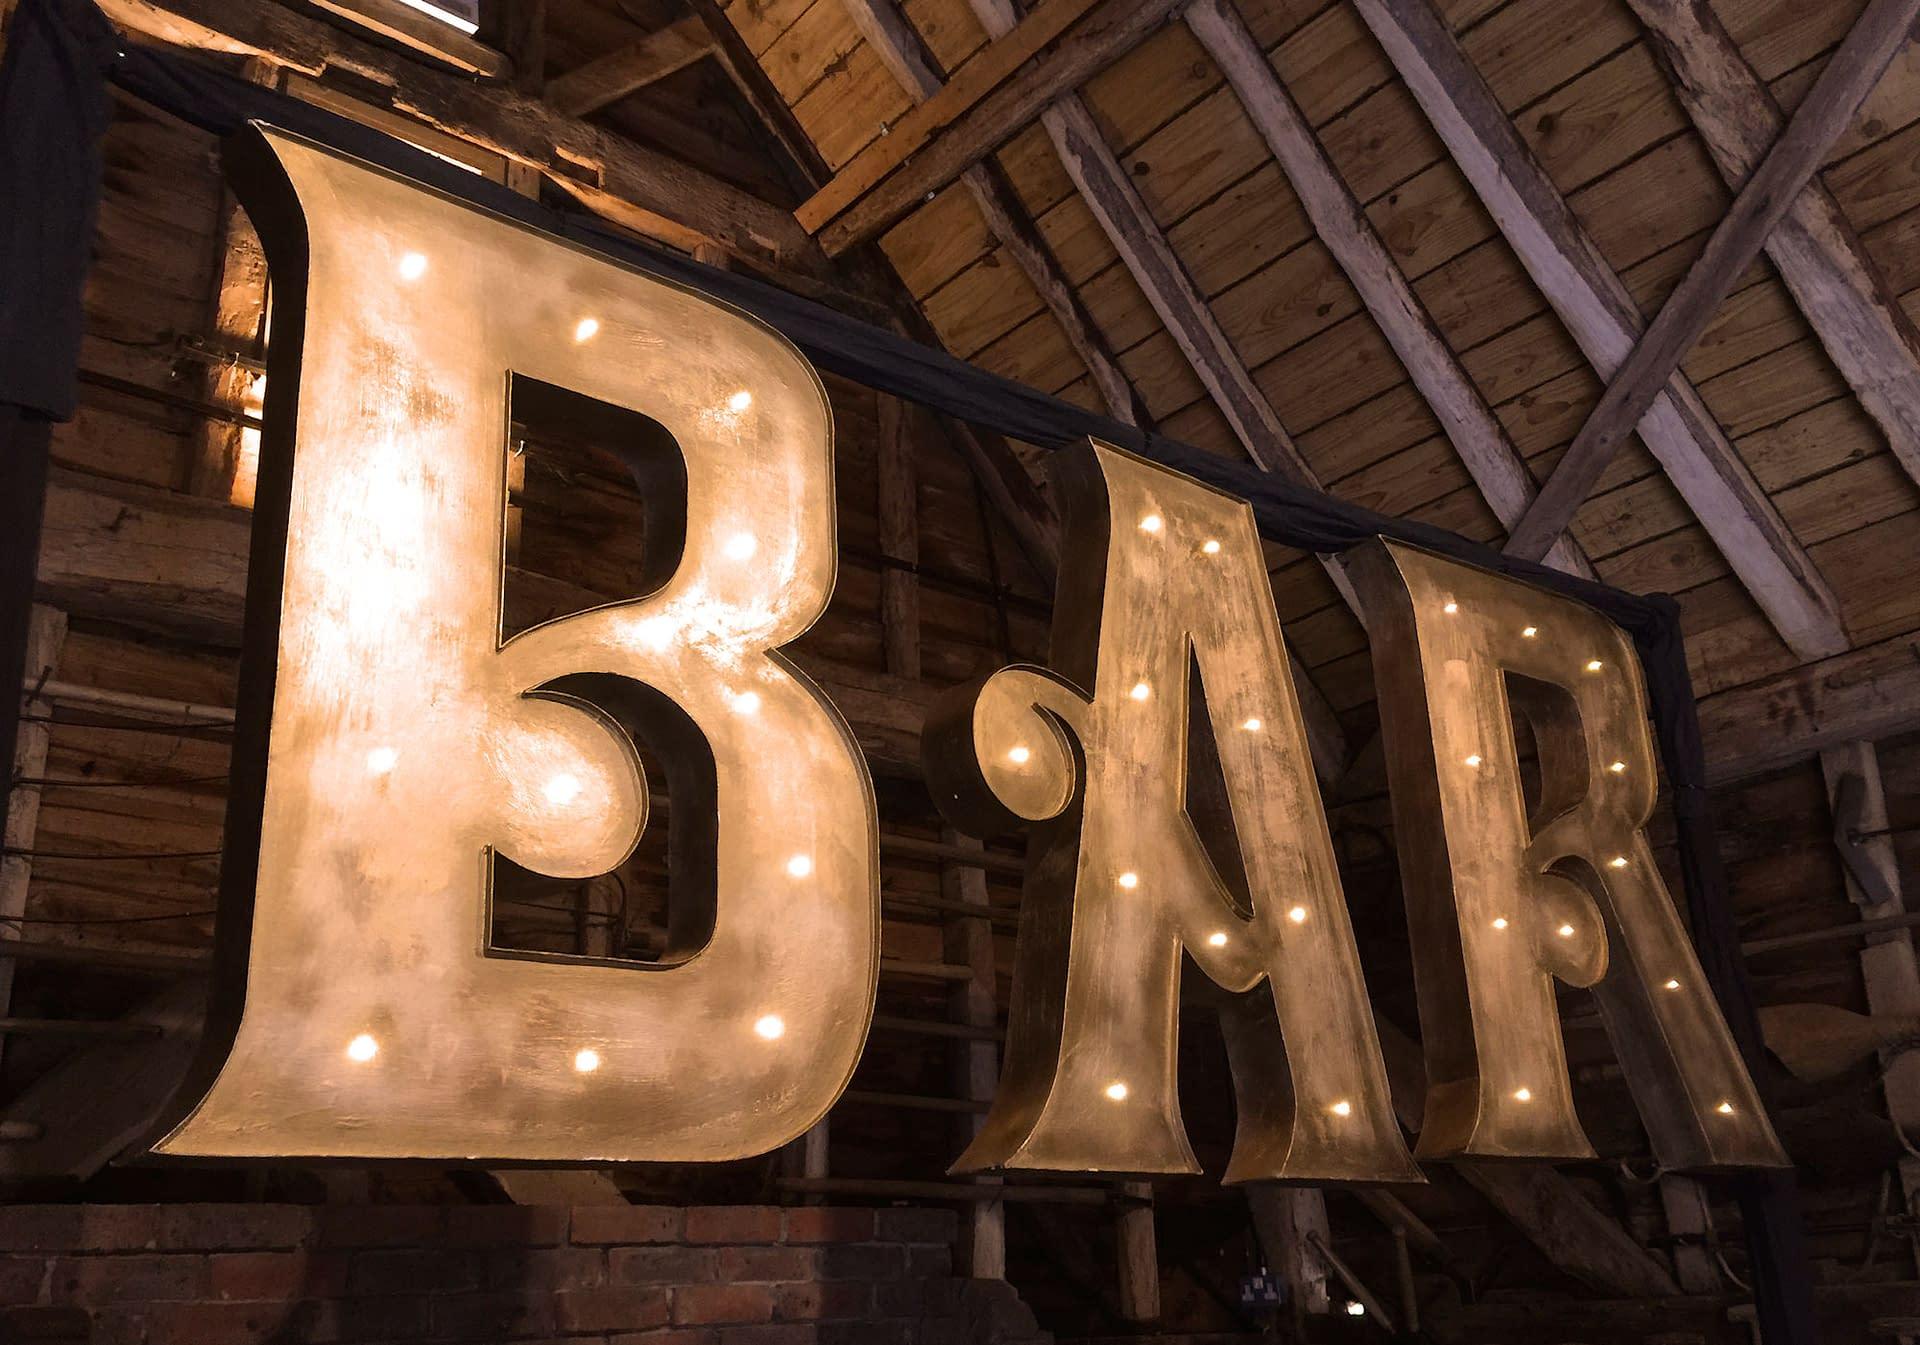 Large illuminated BAR letters in antique gold finish at Gildings Barn, UK wedding venue